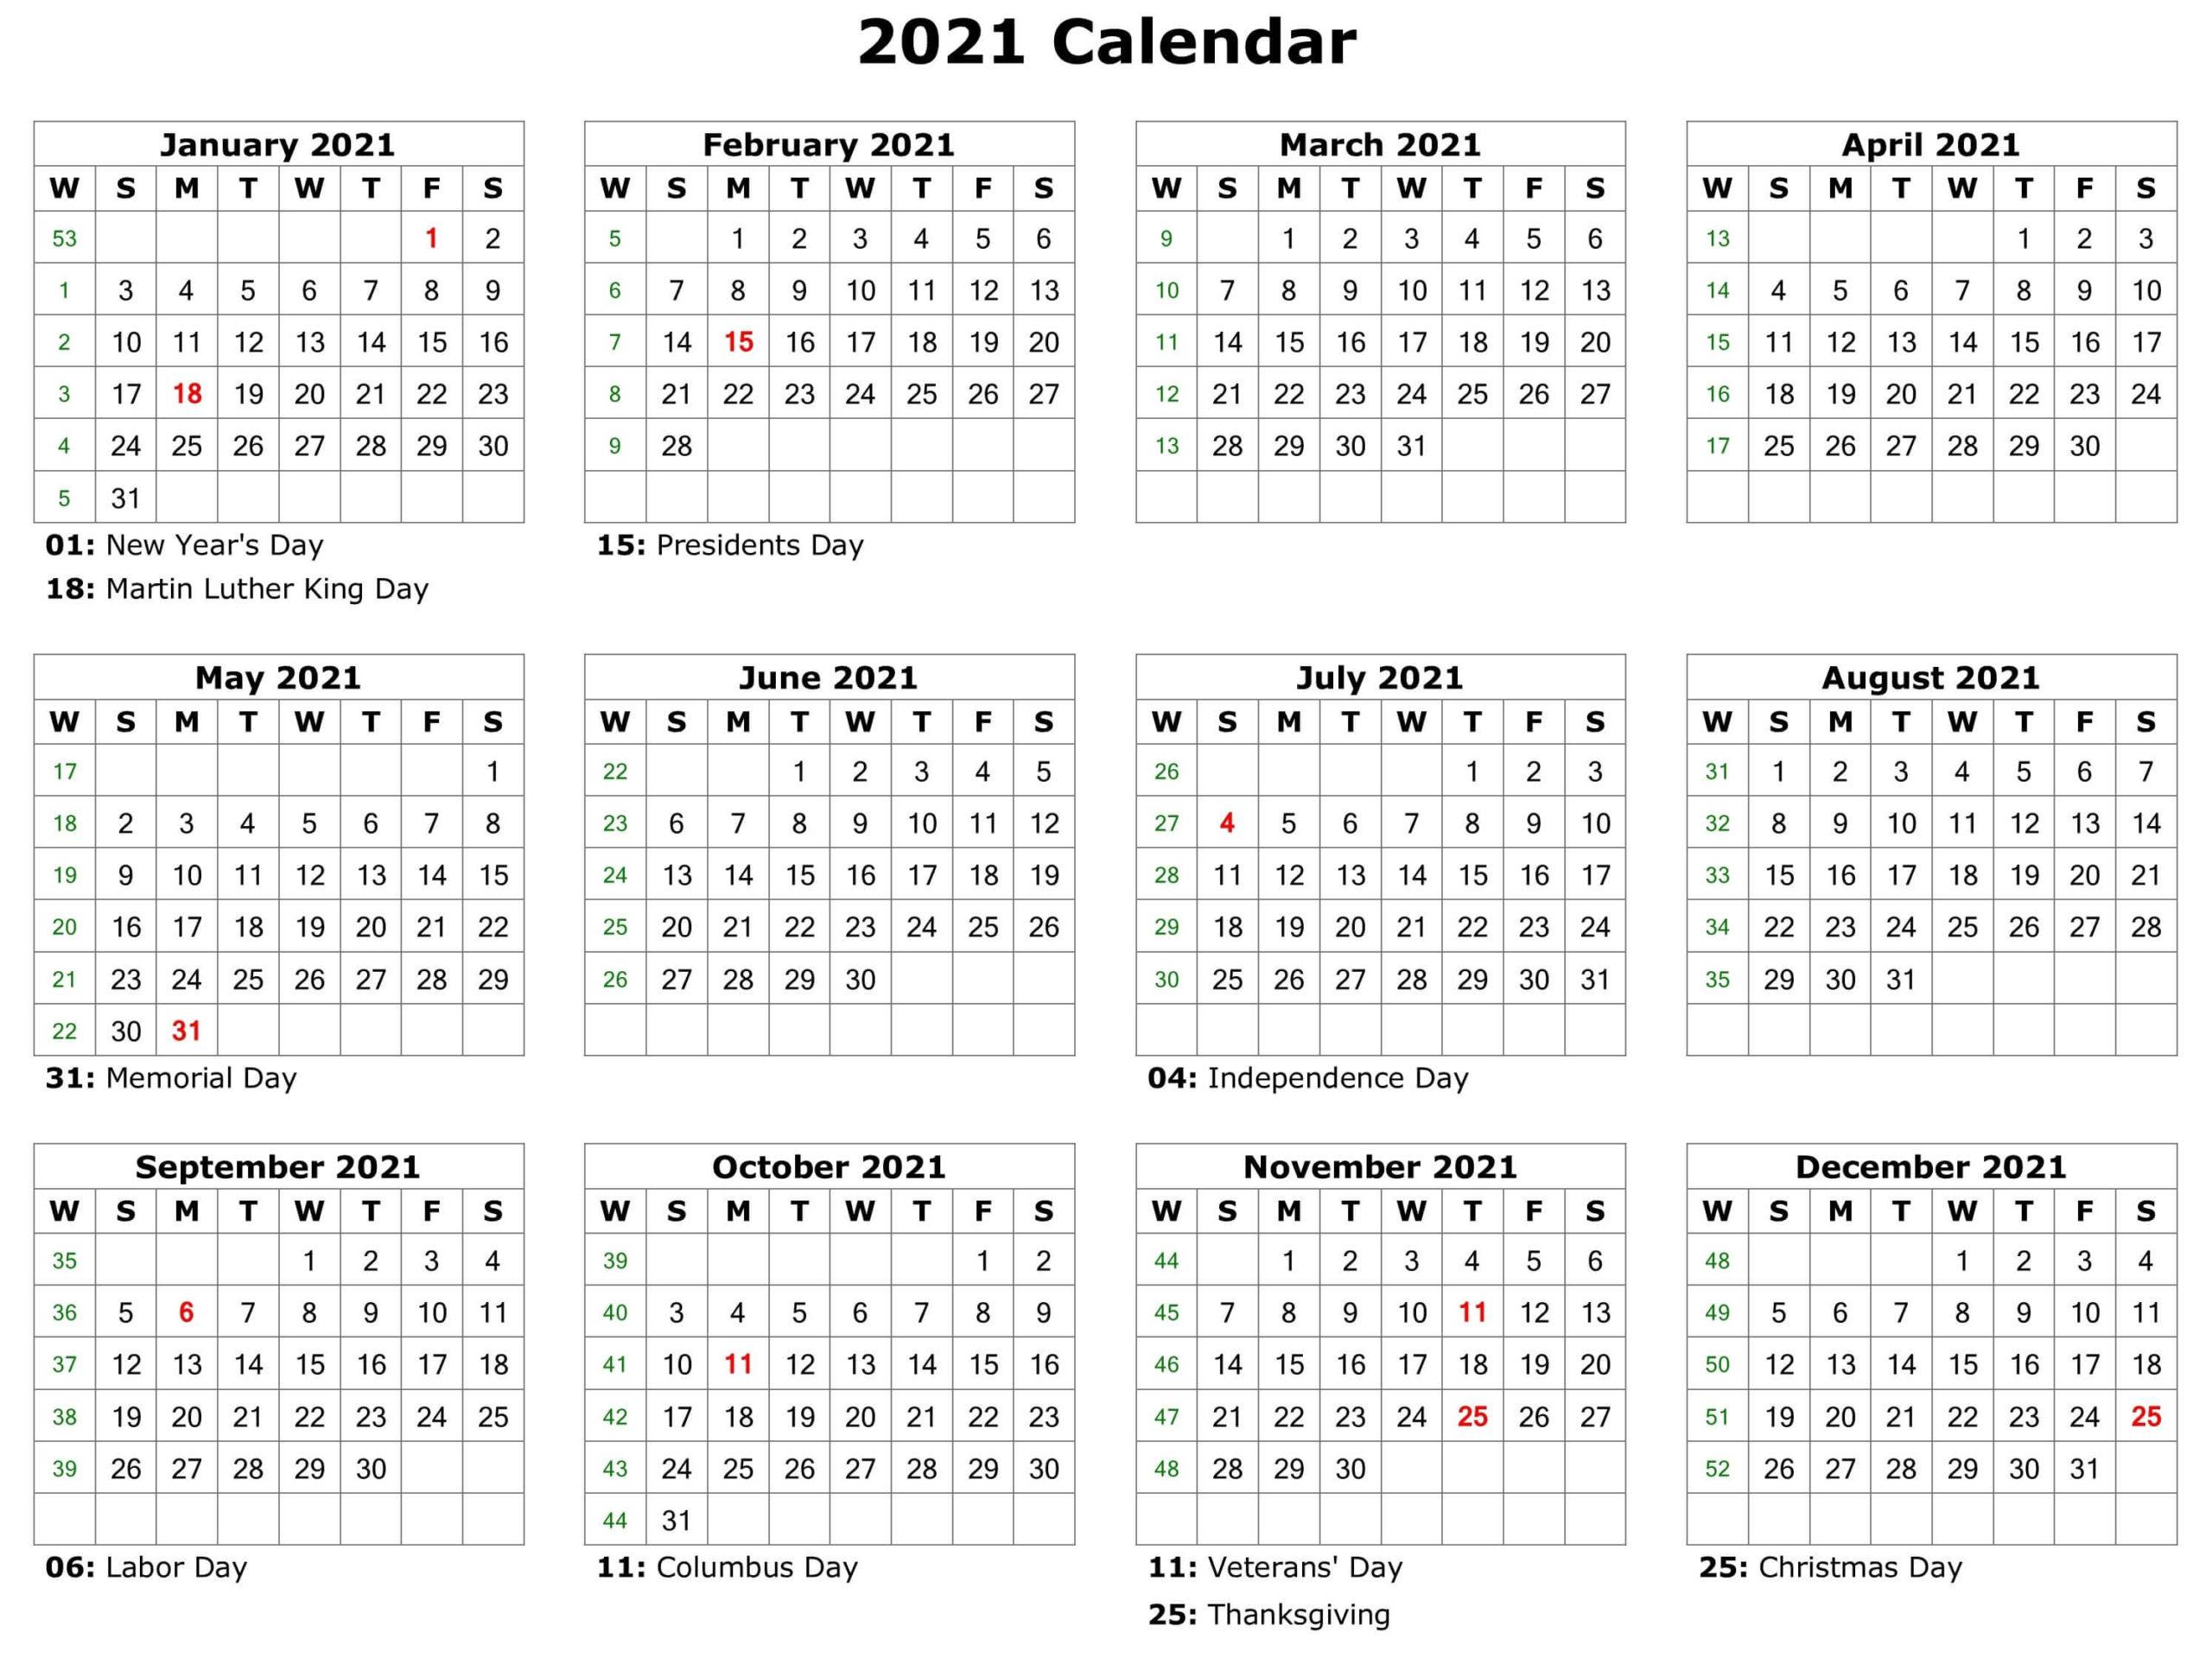 2021 Holidays Calendar